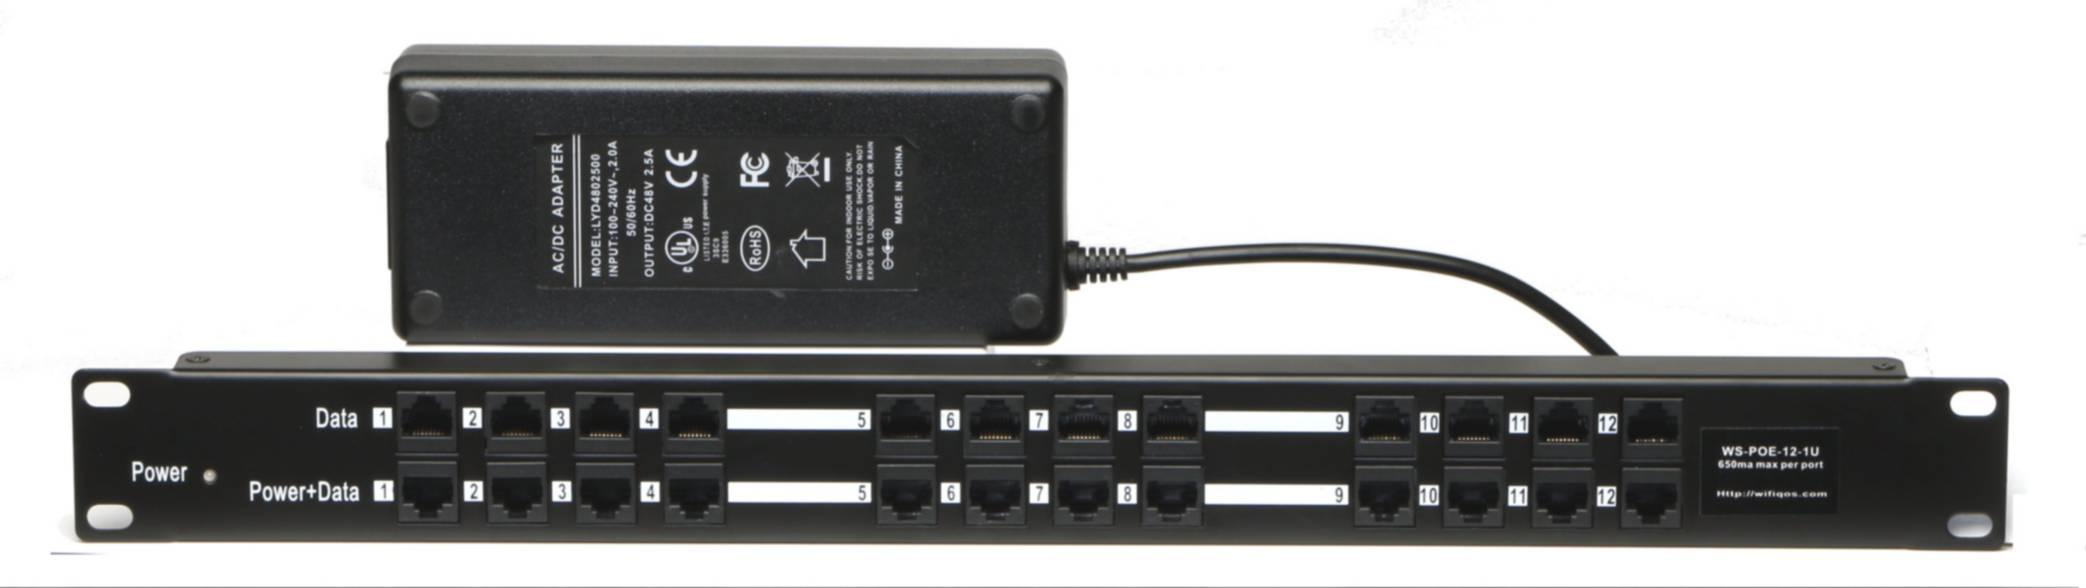 Passive 8 port POE injector